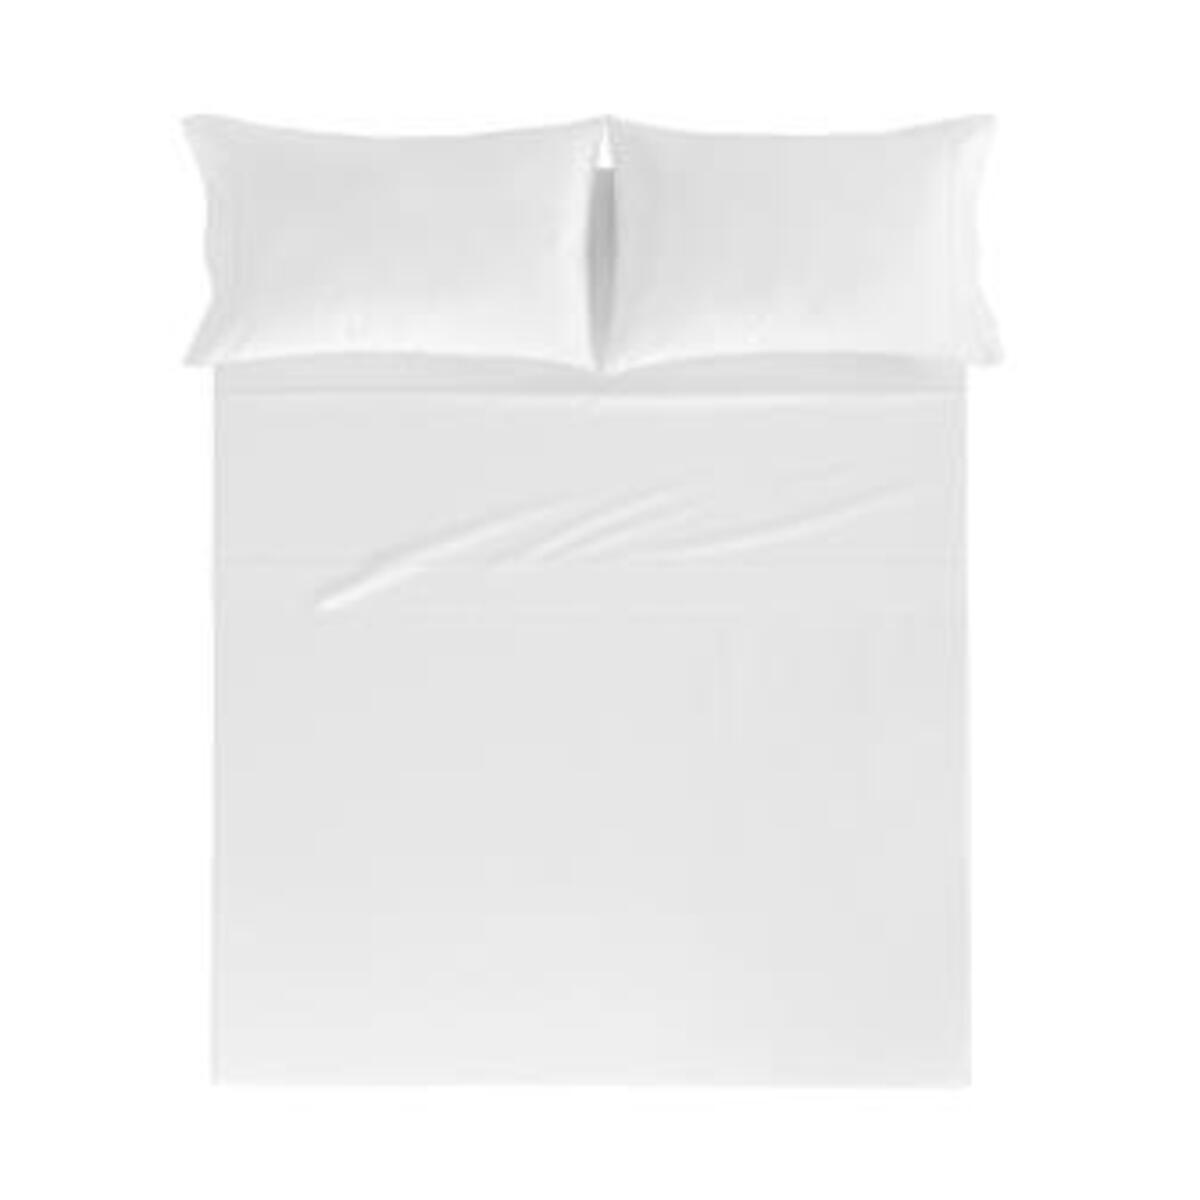 Drap de lit en coton percale blanc 250x280